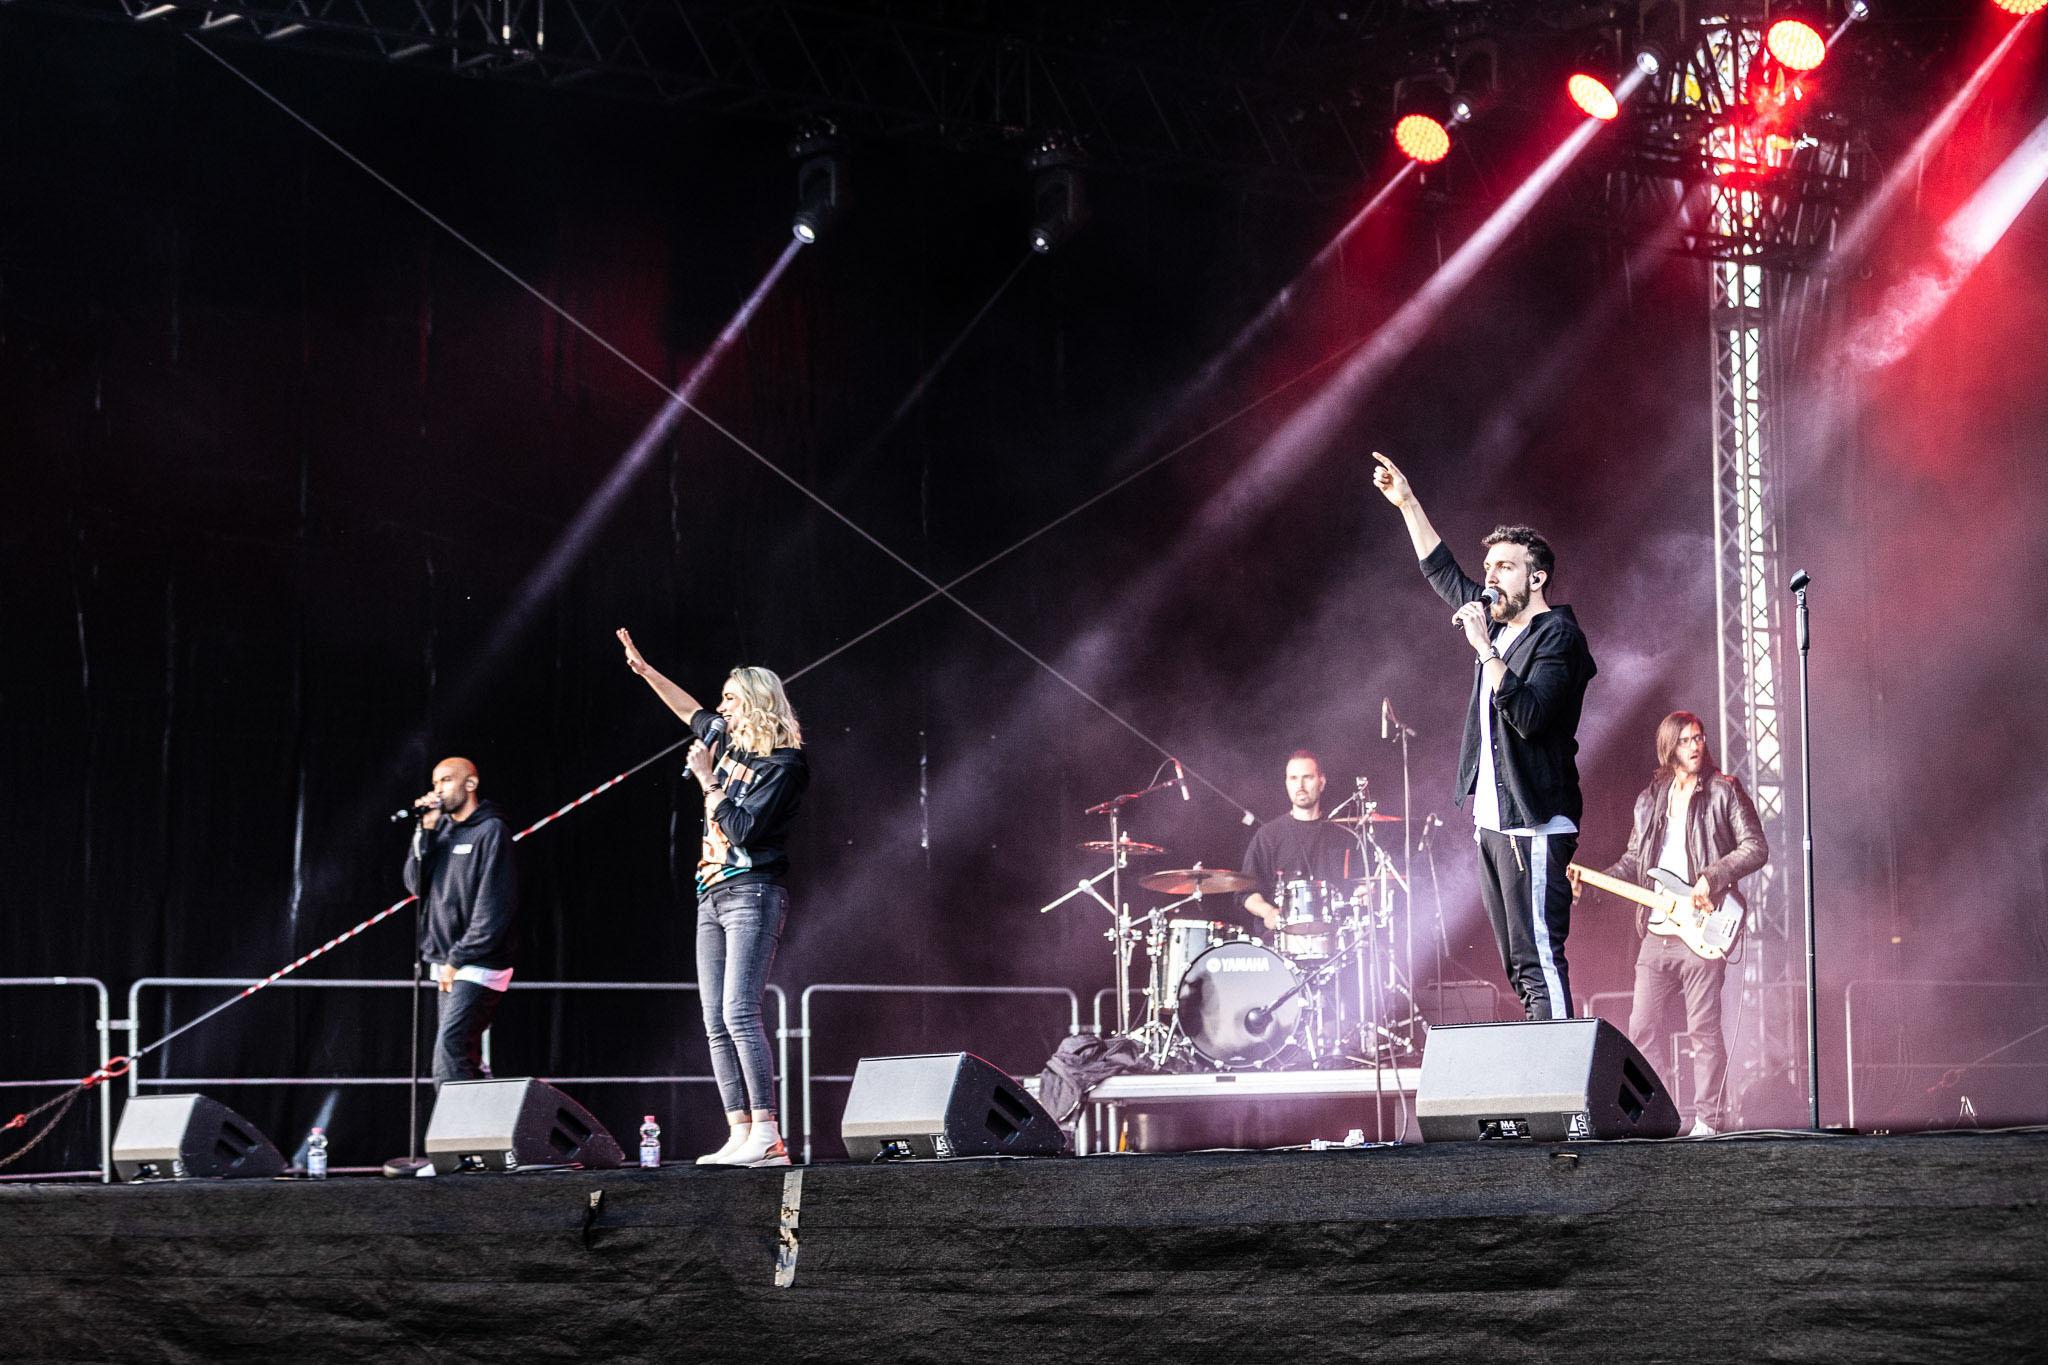 Fresh_Music_Live_Coverband_Media_24